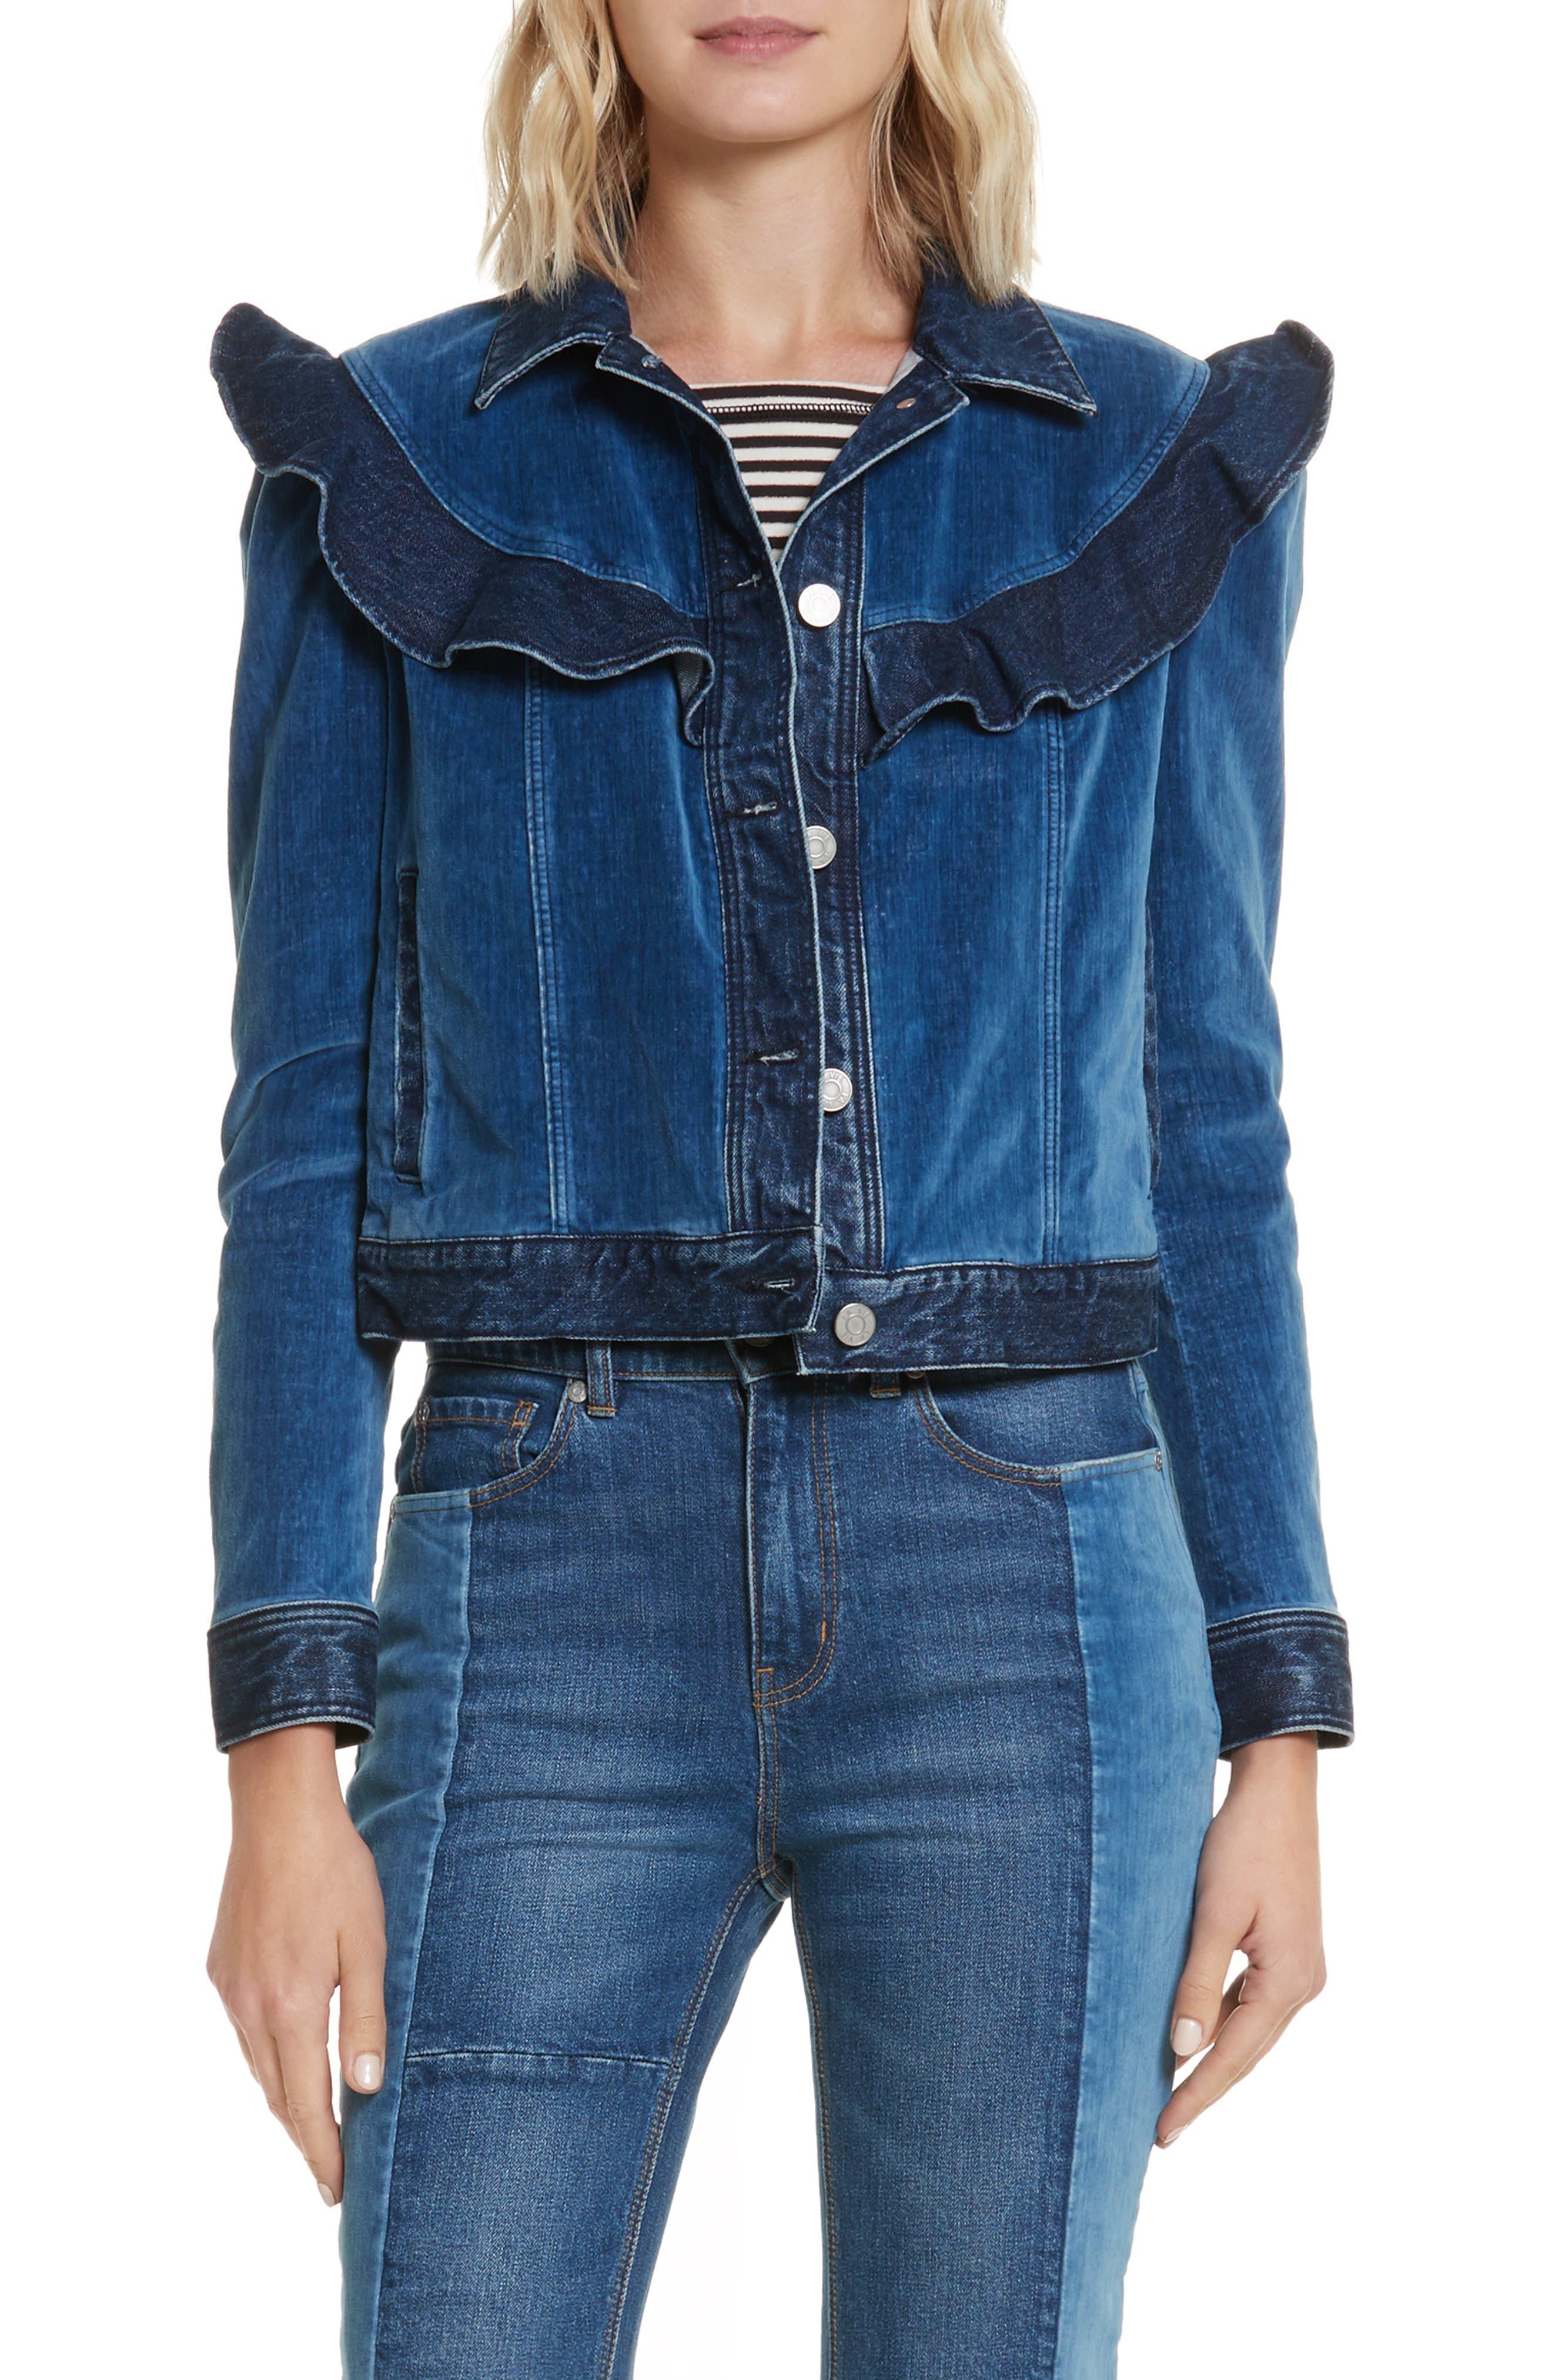 La Vie Rebecca Taylor Velvet Denim Jacket